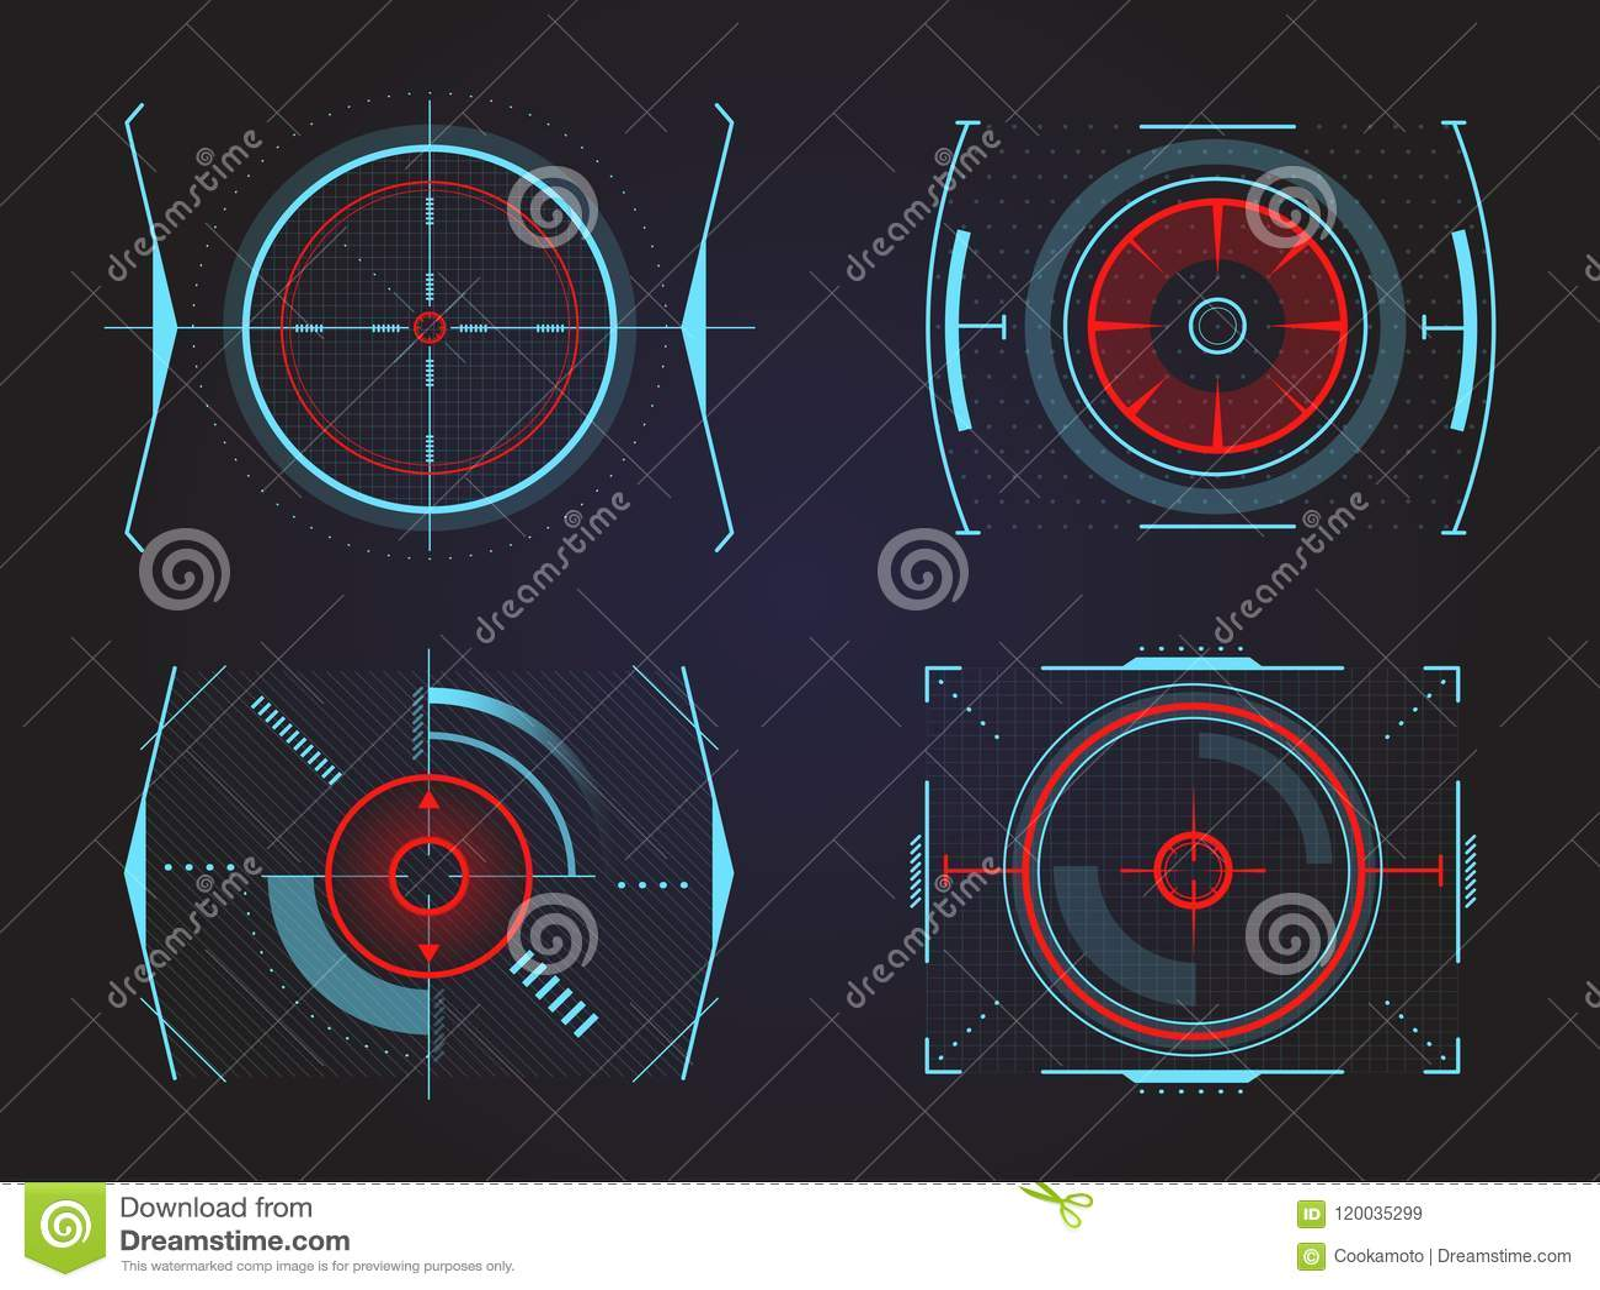 Futuristic Crosshair Or Aim, Radar Or Location Stock Vector